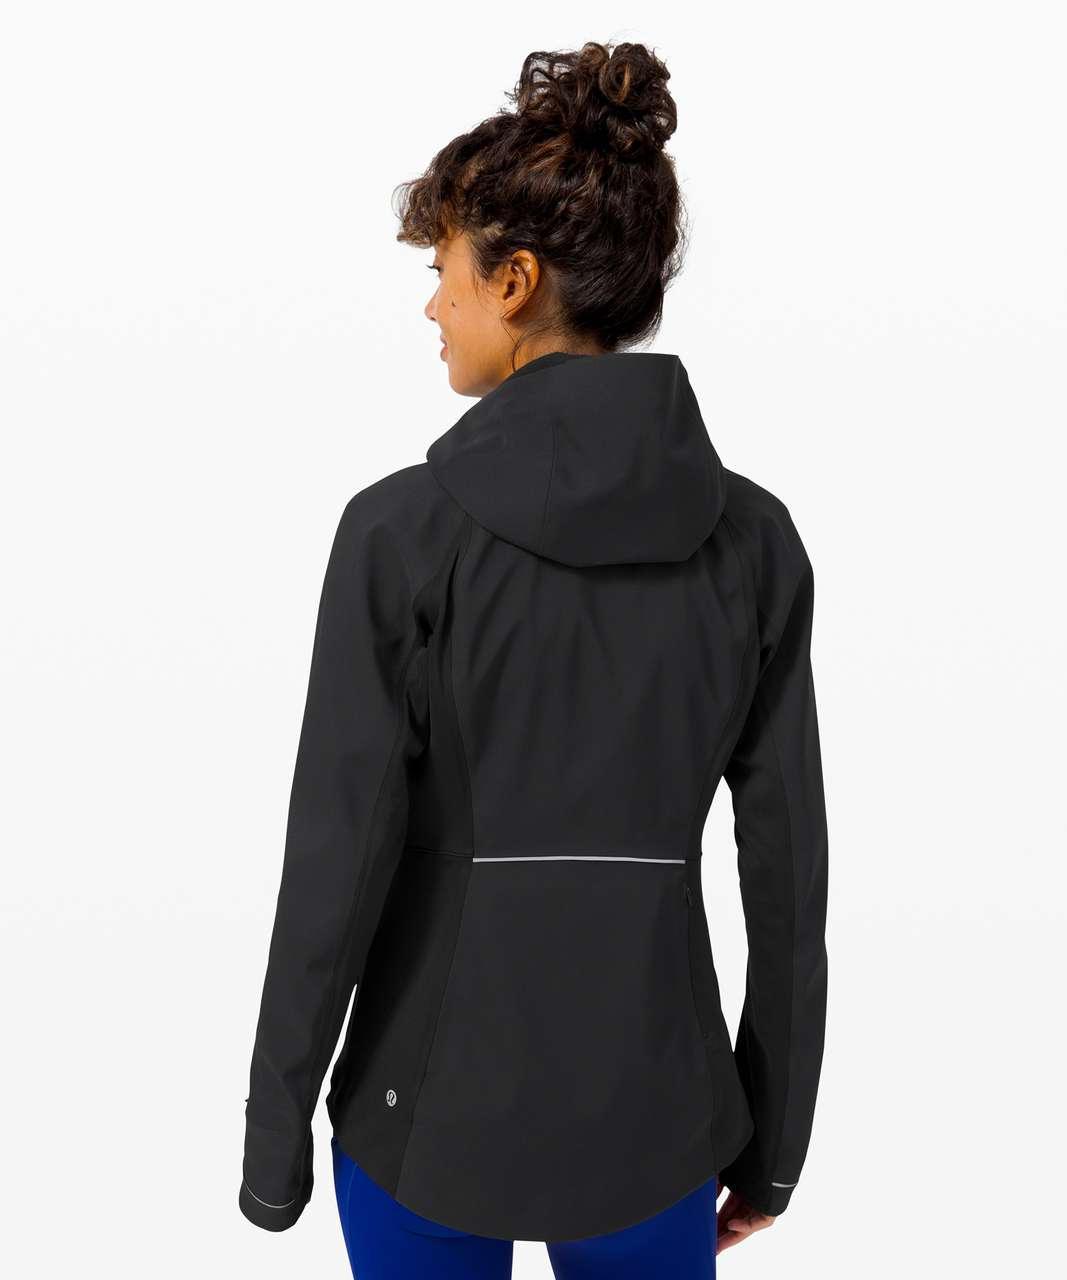 Lululemon Cross Chill Jacket - Black